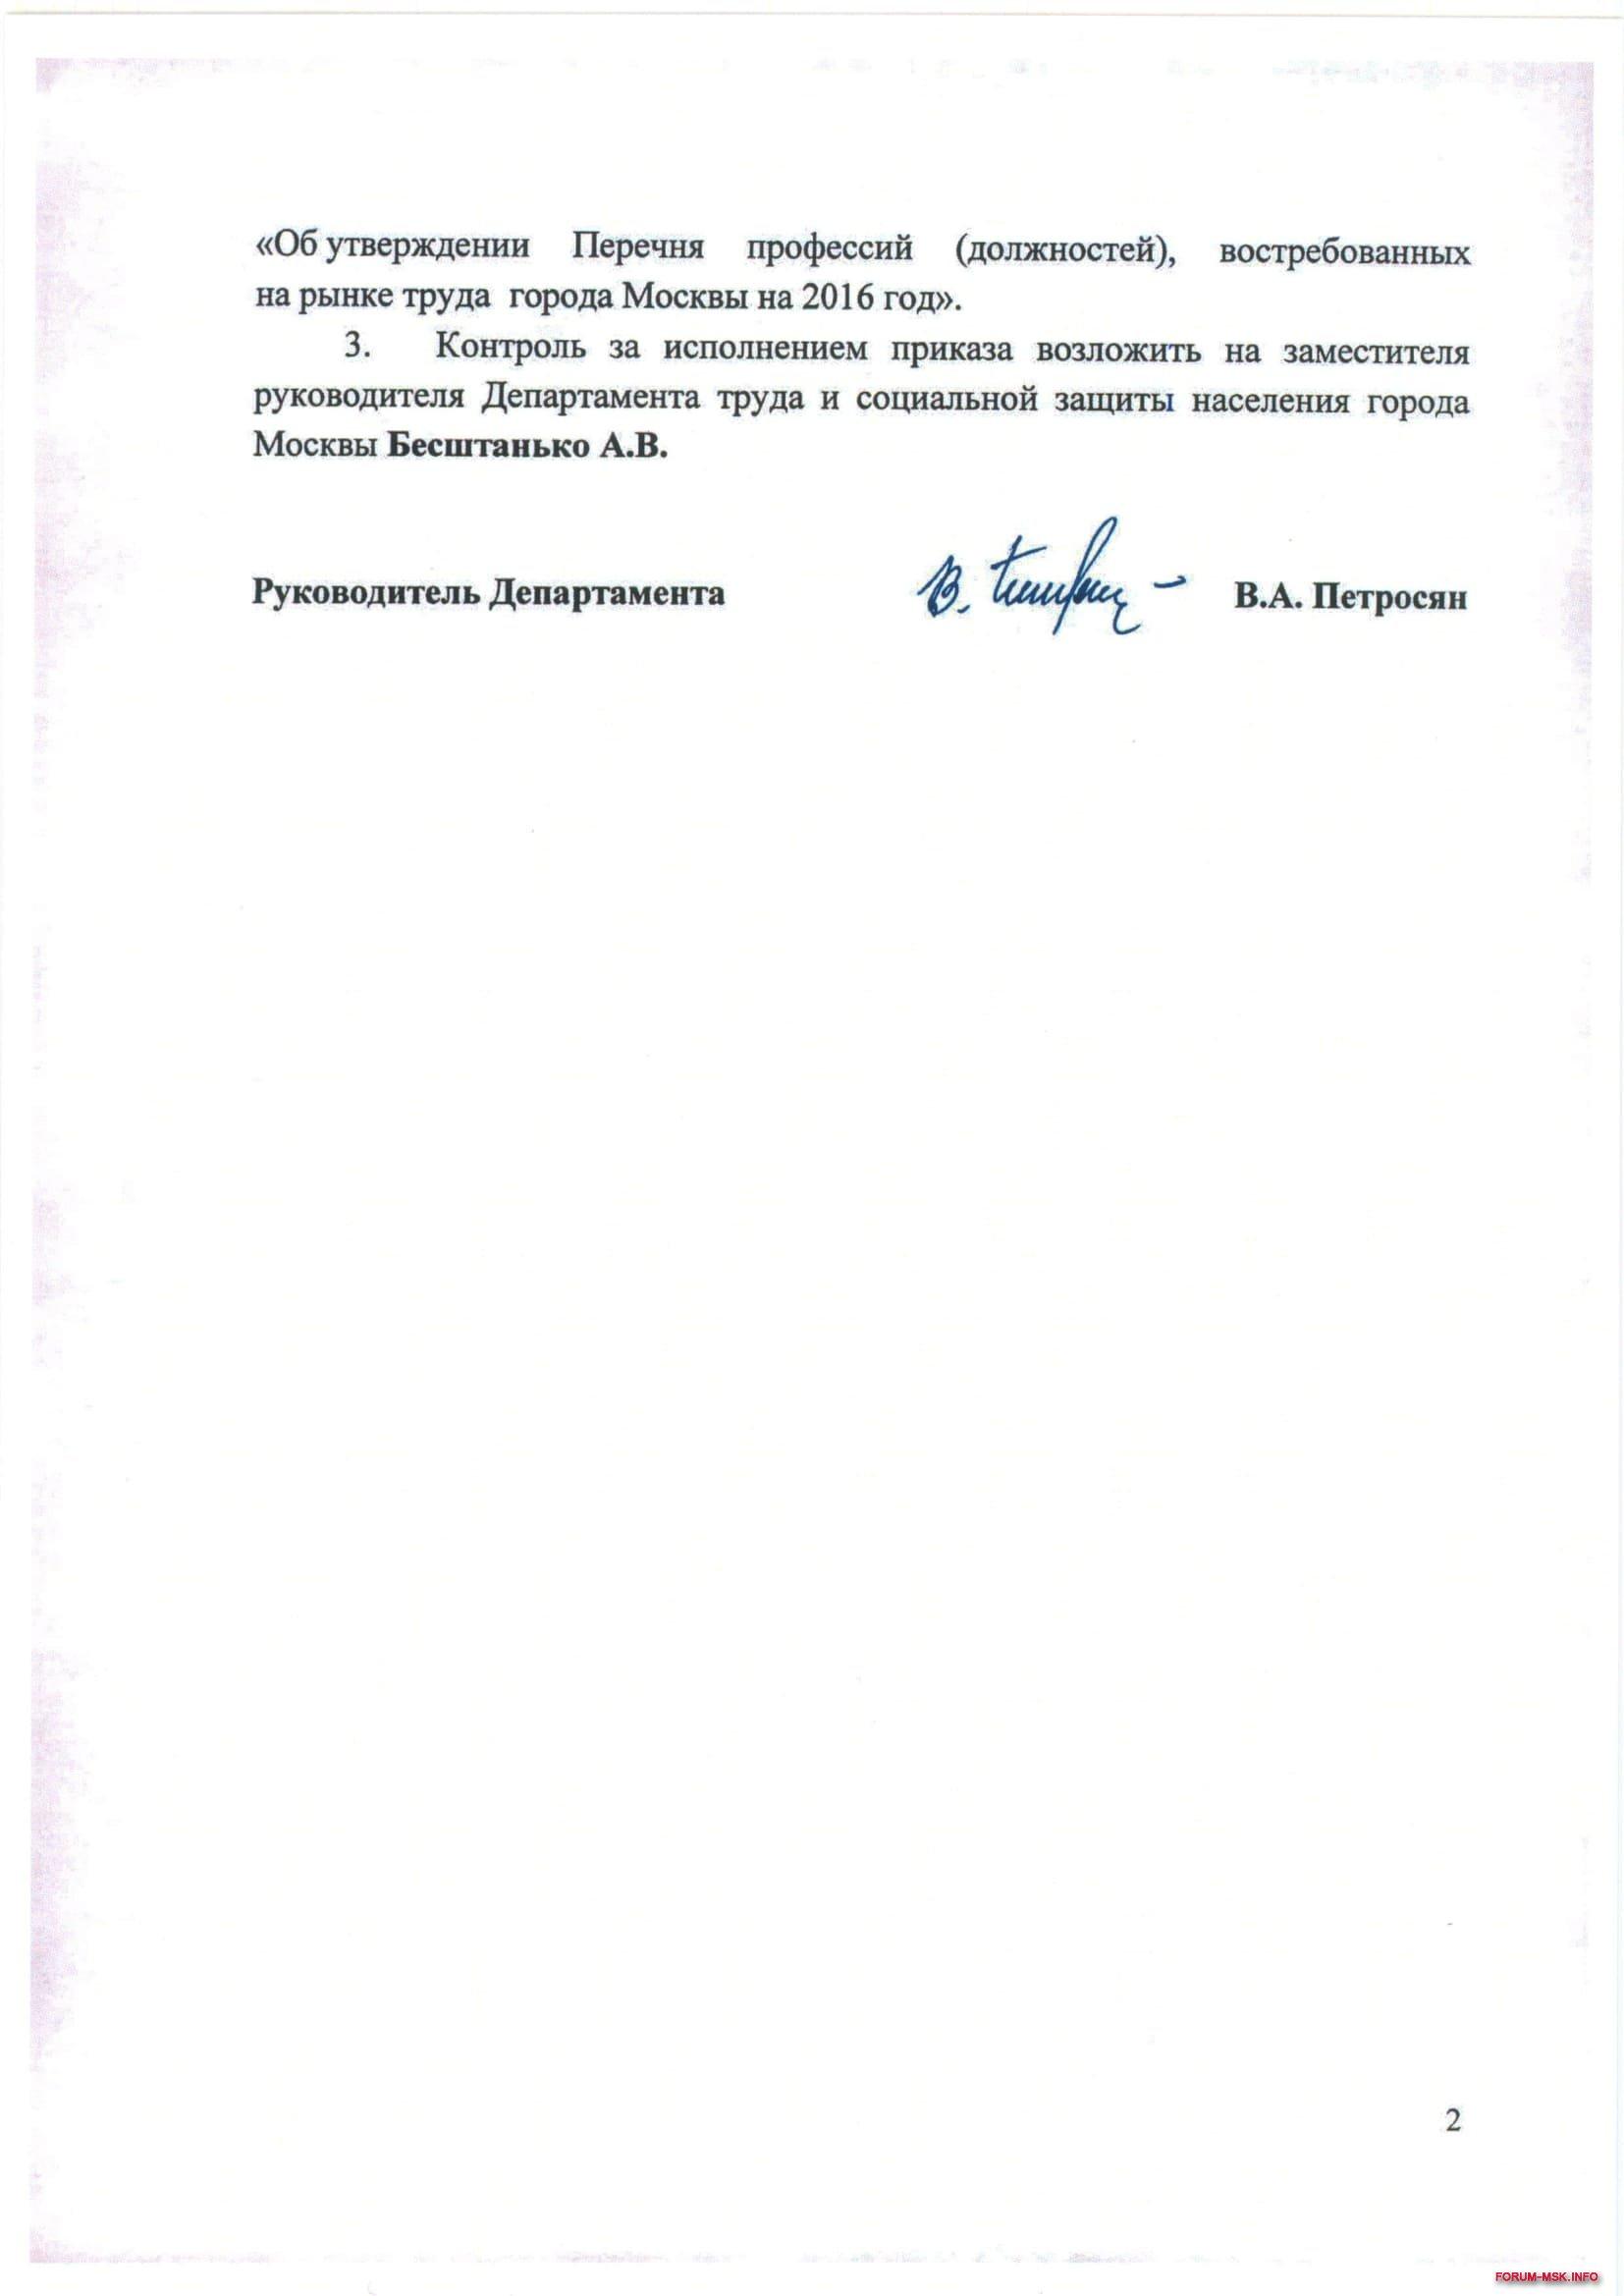 приказ дтсзн города москвы №1334-02.jpg